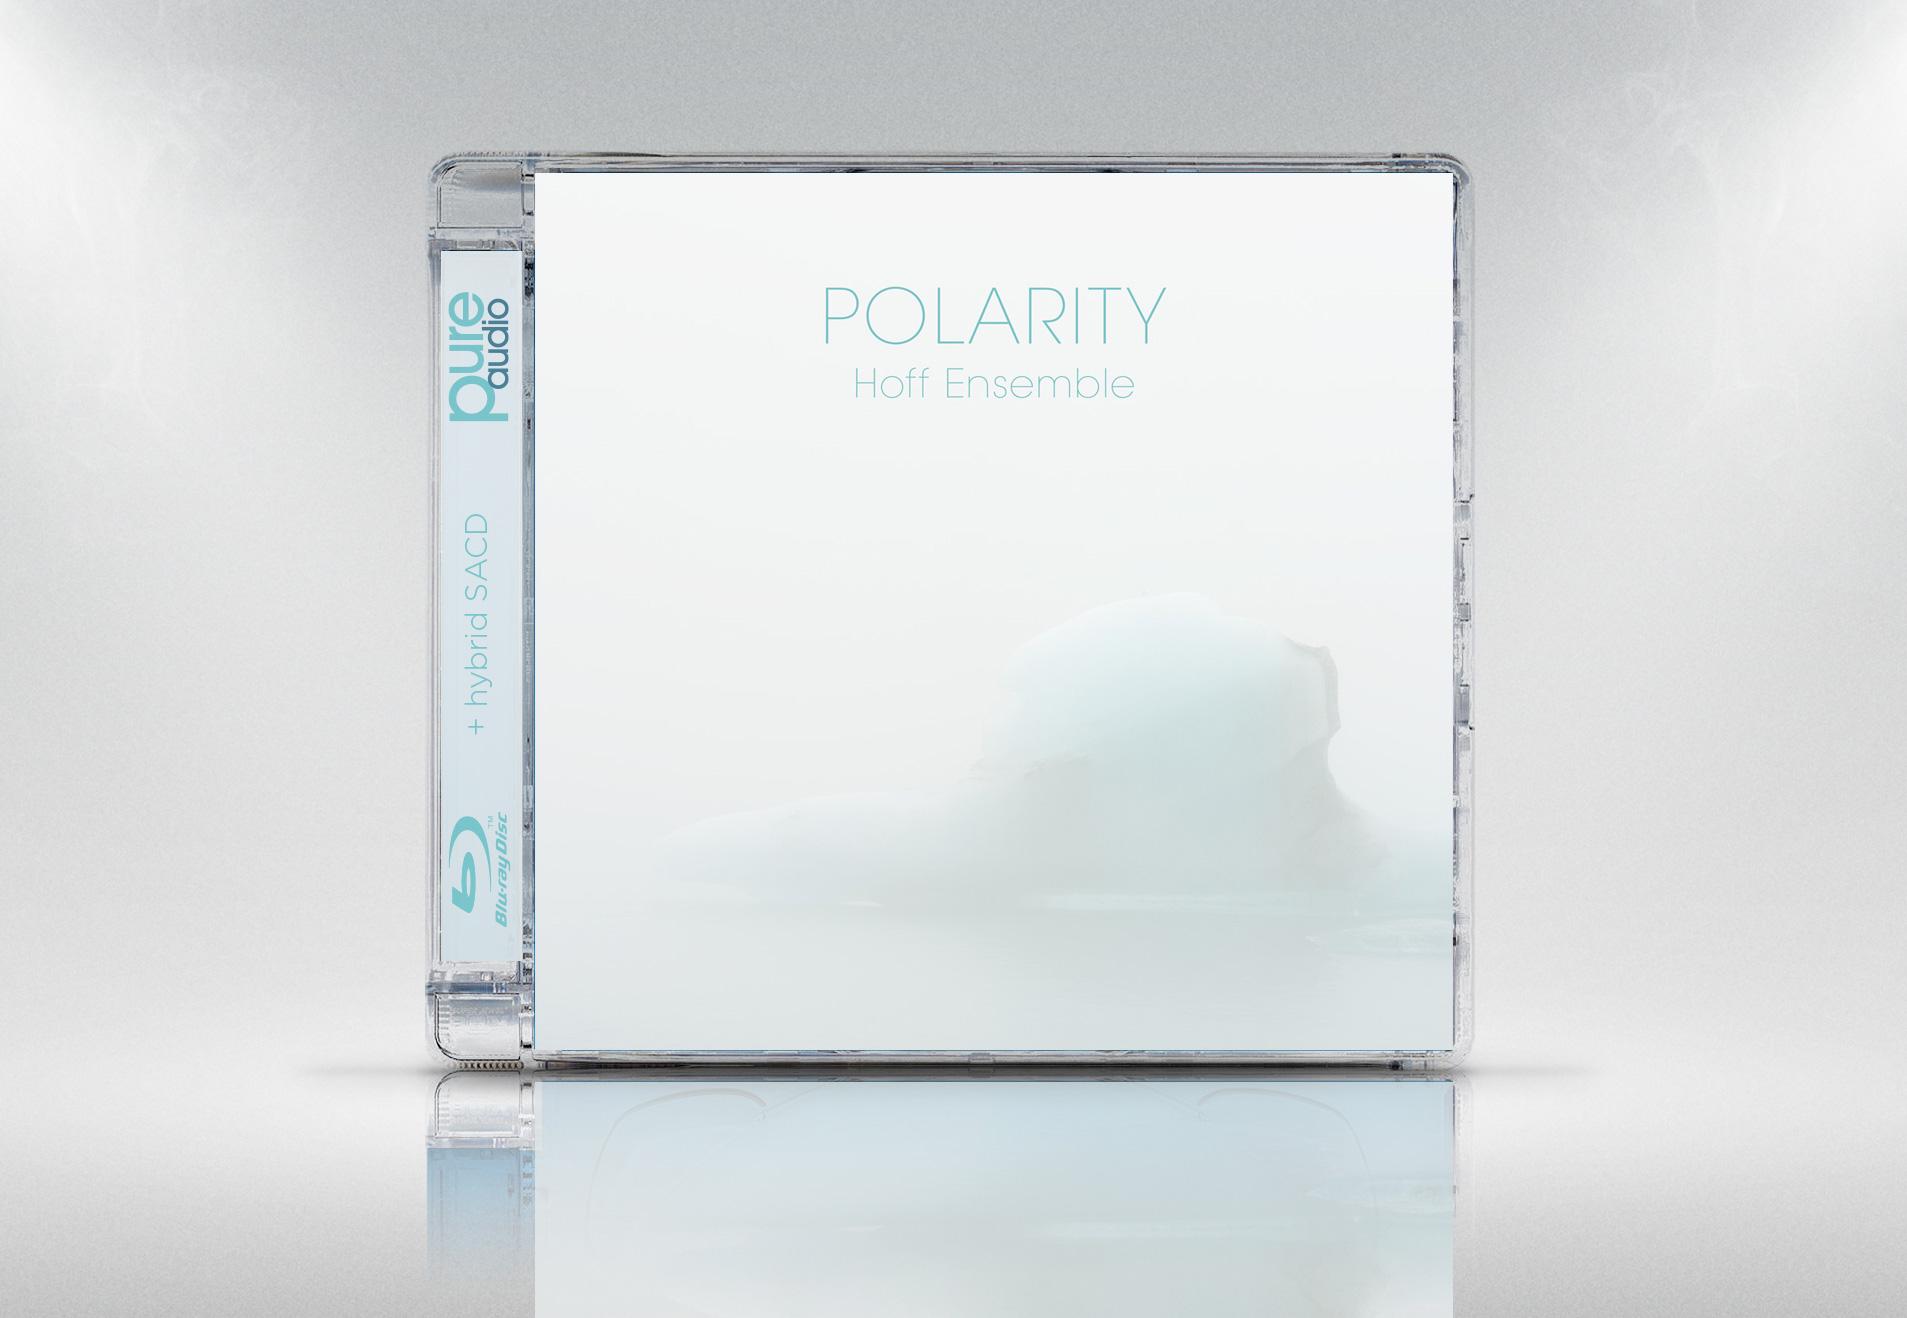 Album: POLARITY - an acoustic jazz project (2L-145-SABD) Hoff Ensemble